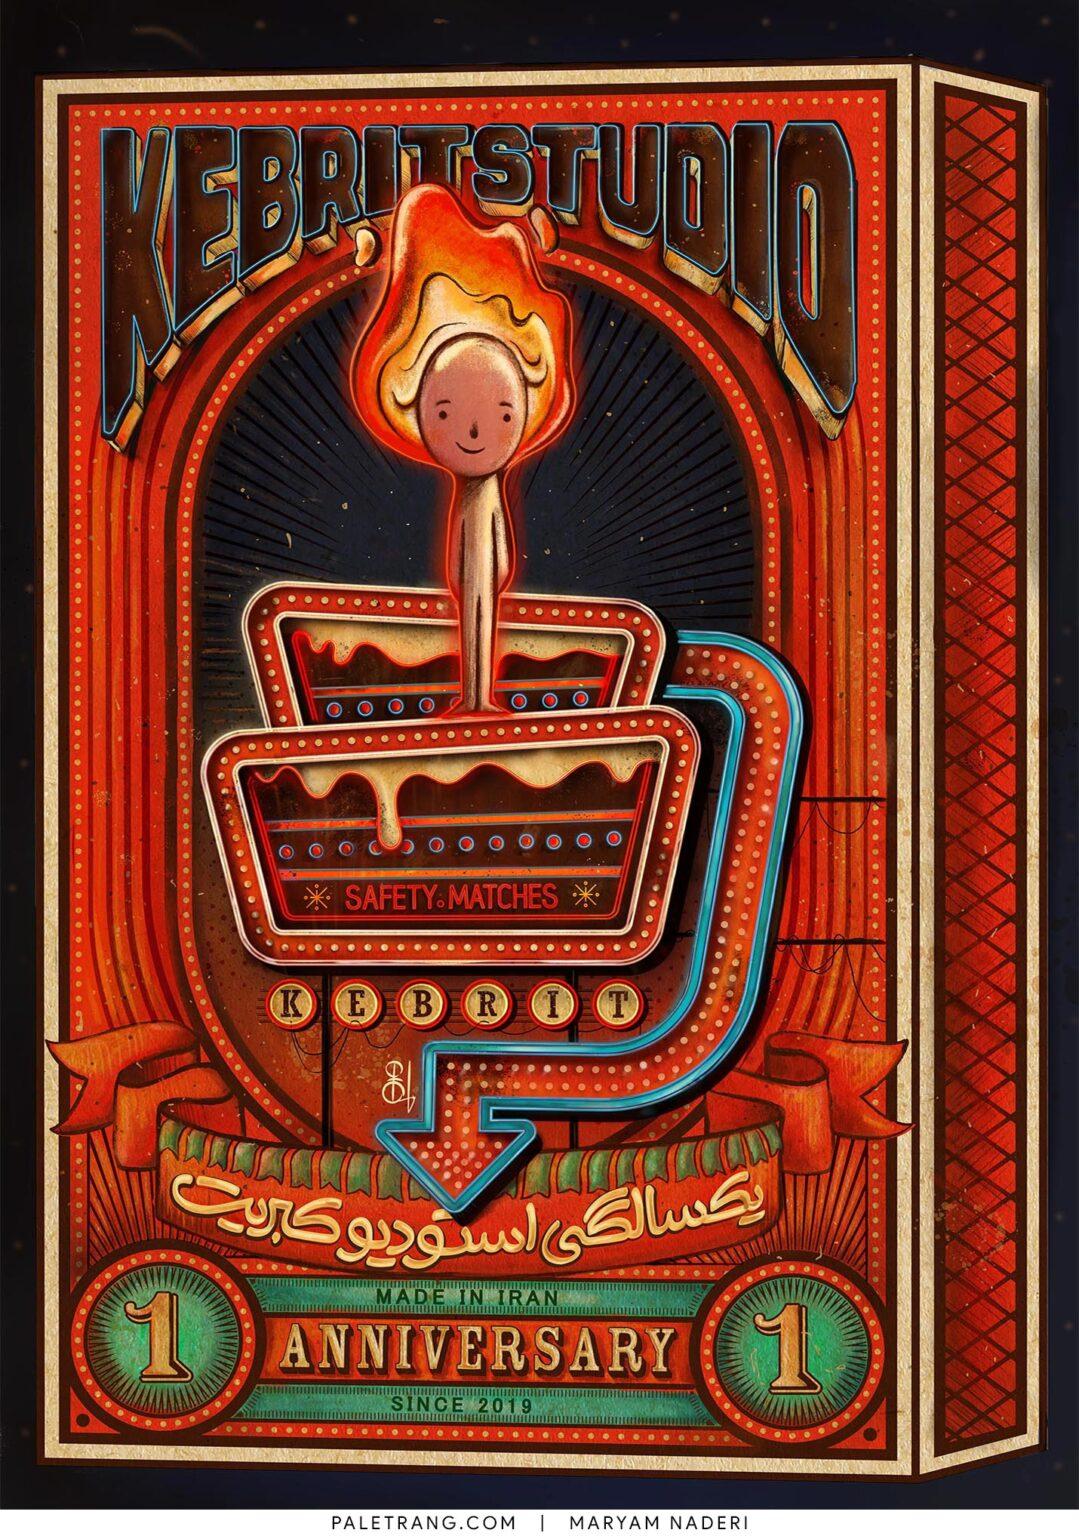 پوستر یکسالگی استودیو کبریت اثر مریم نادری